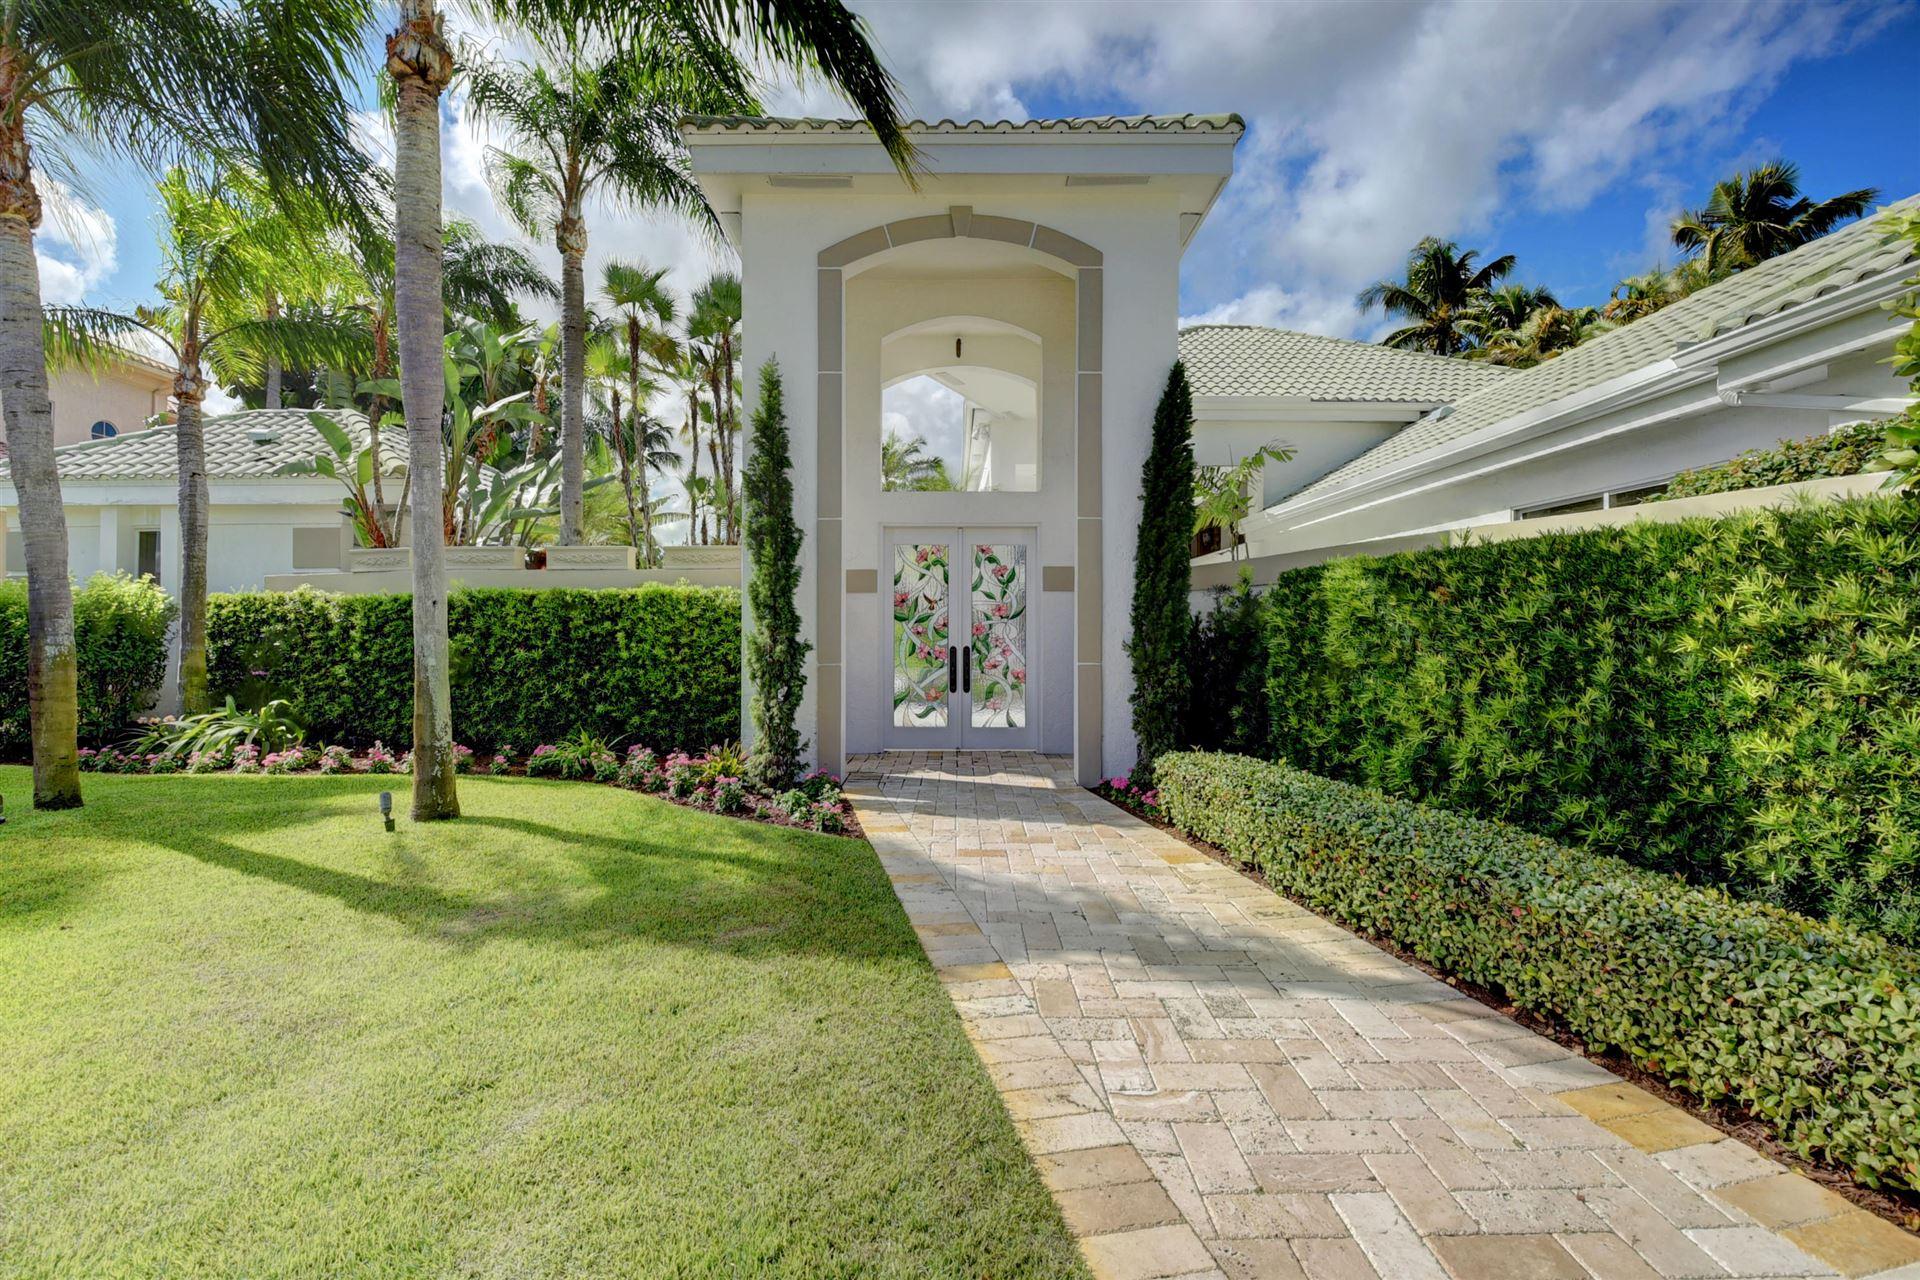 17341 Allenbury Court, Boca Raton, FL 33496 - #: RX-10553709